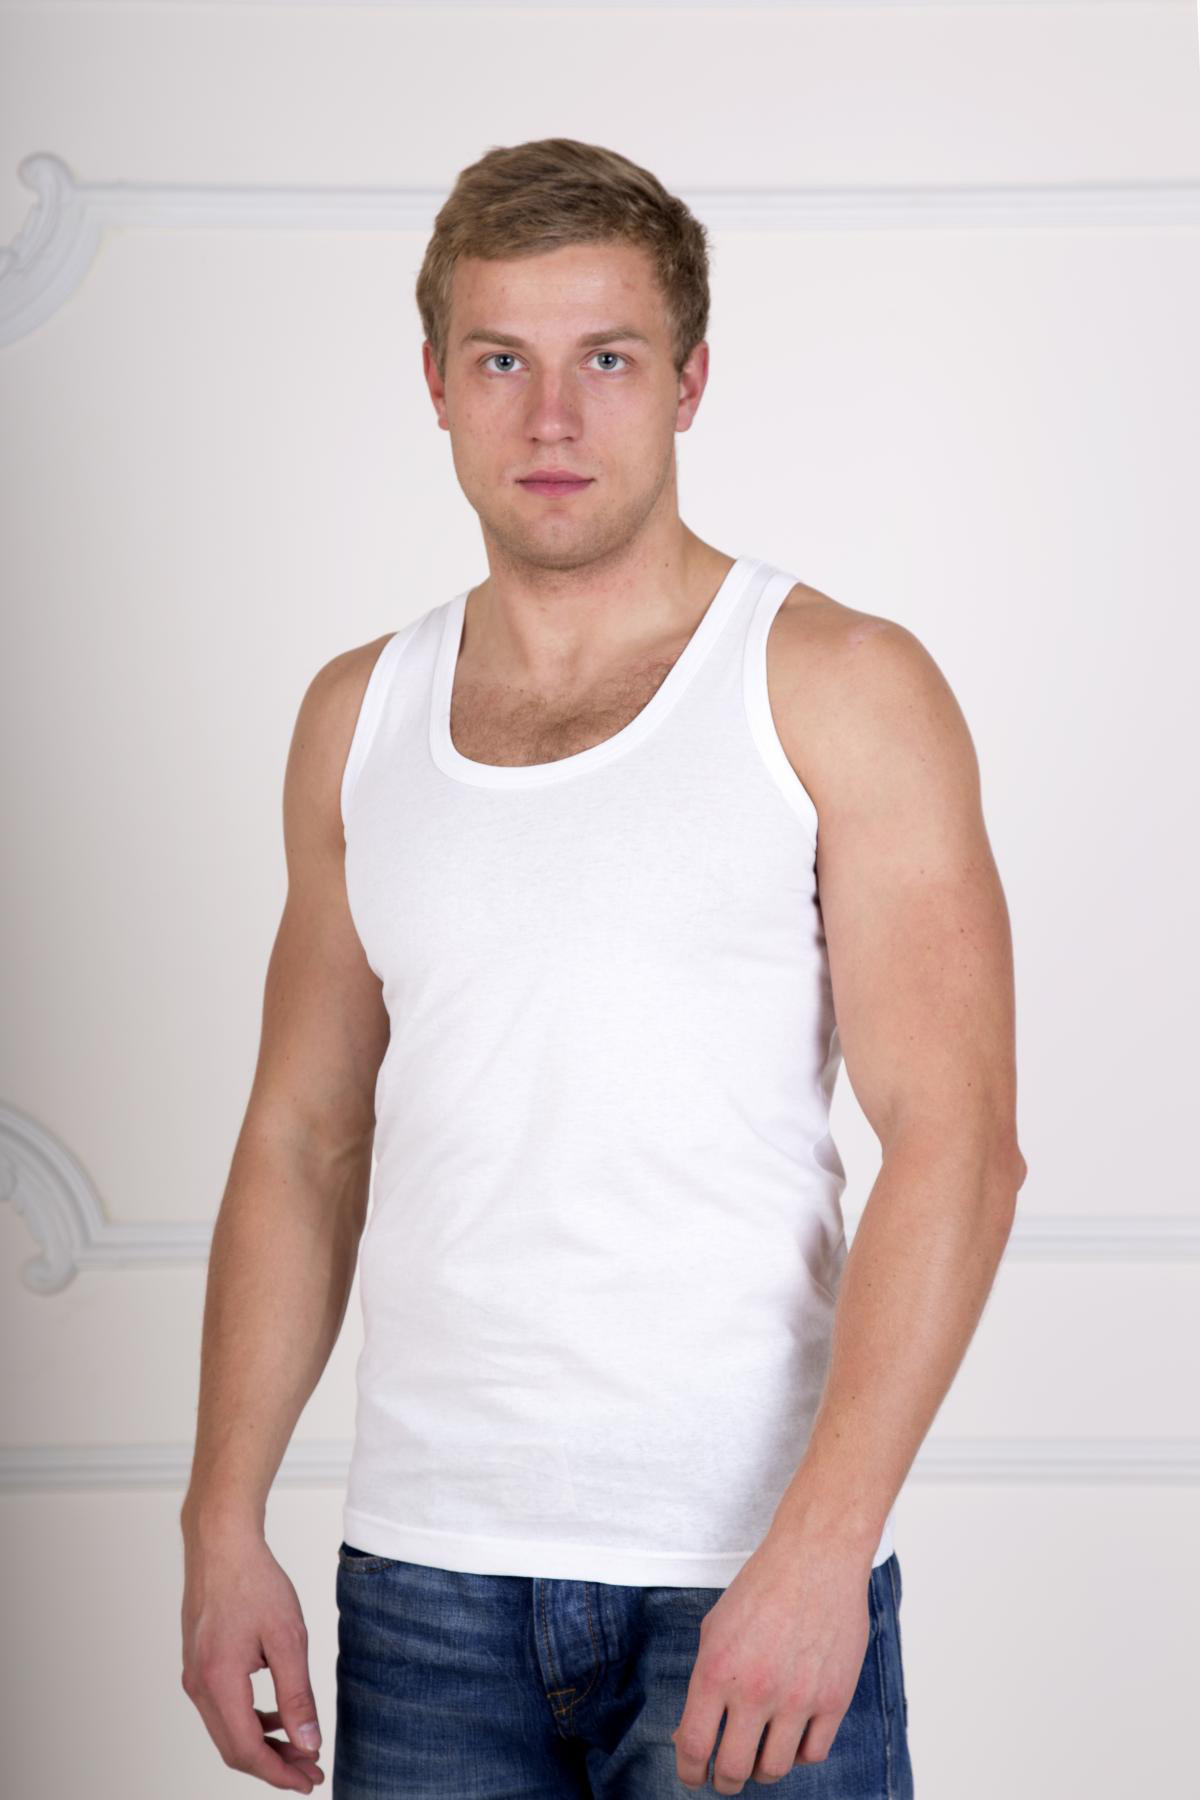 Муж. майка Верн Белый р. 50Майки и футболки<br>Факт. ОГ: 90 см <br>Факт. ОТ: 88 см <br>Факт. ОБ: 90 см <br>Длина по спинке: 74 см<br><br>Тип: Муж. майка<br>Размер: 50<br>Материал: Кулирка